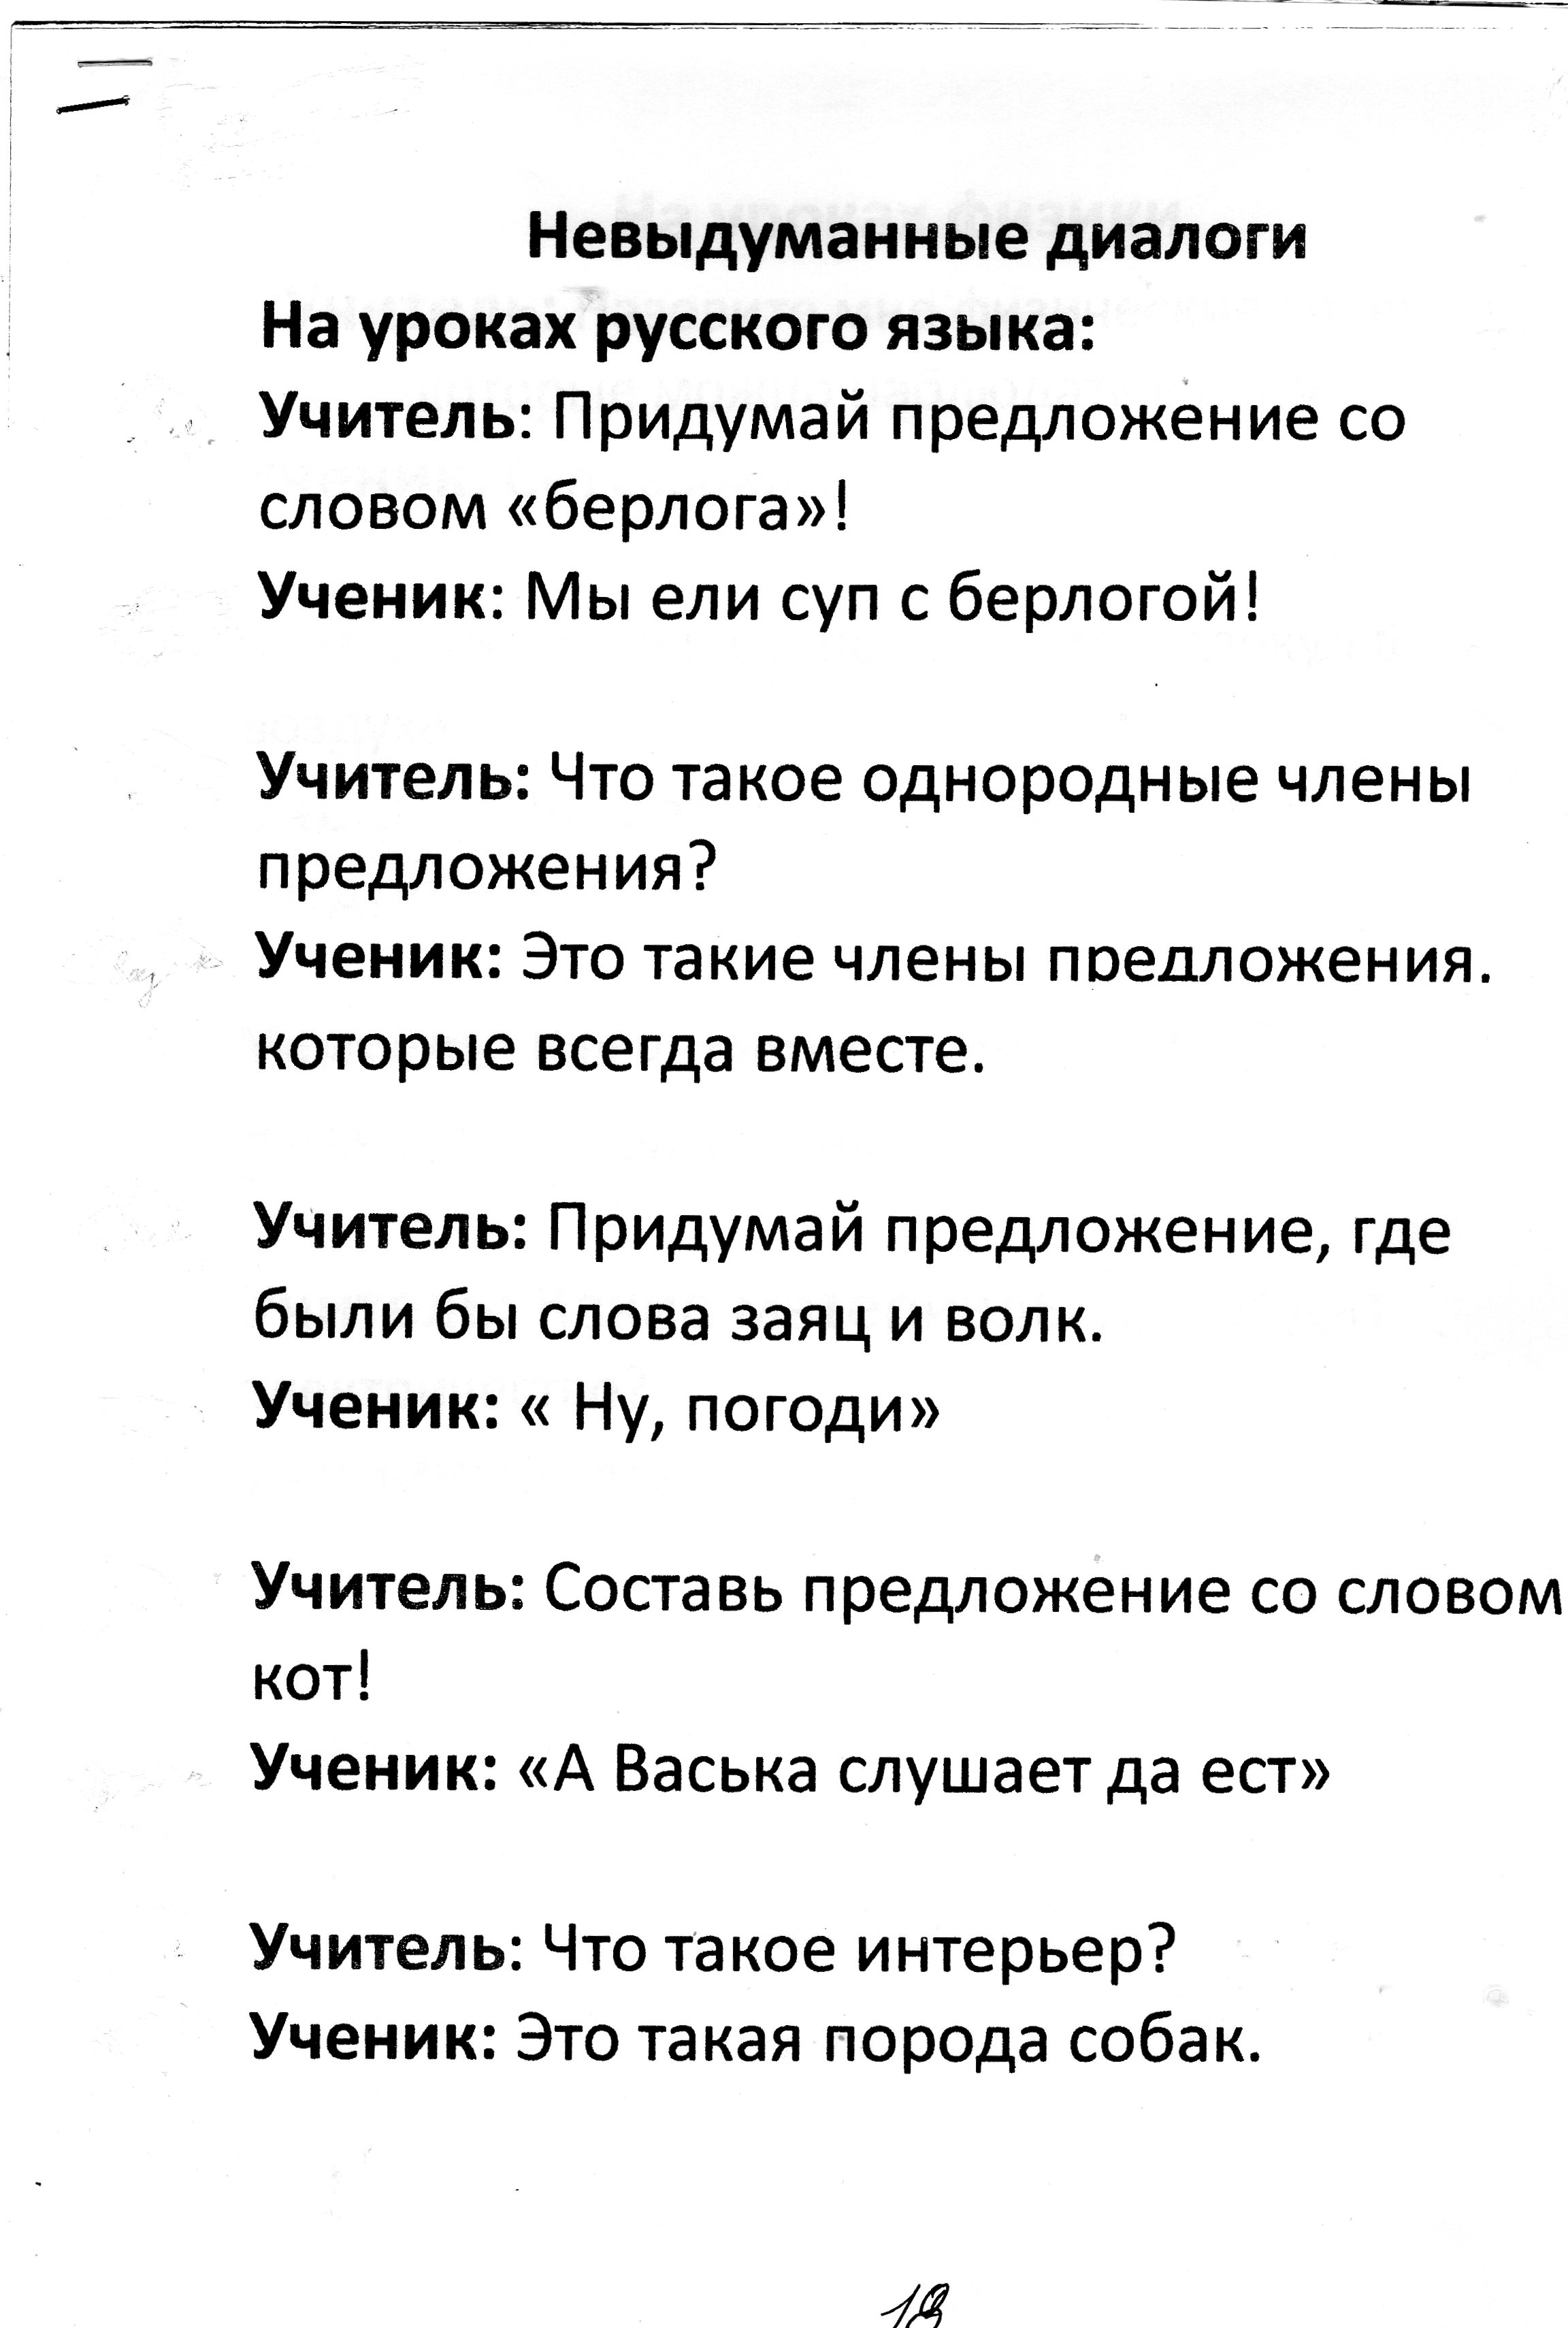 C:\Documents and Settings\ADMIN\Мои документы\9 кл выпускной\img024.jpg